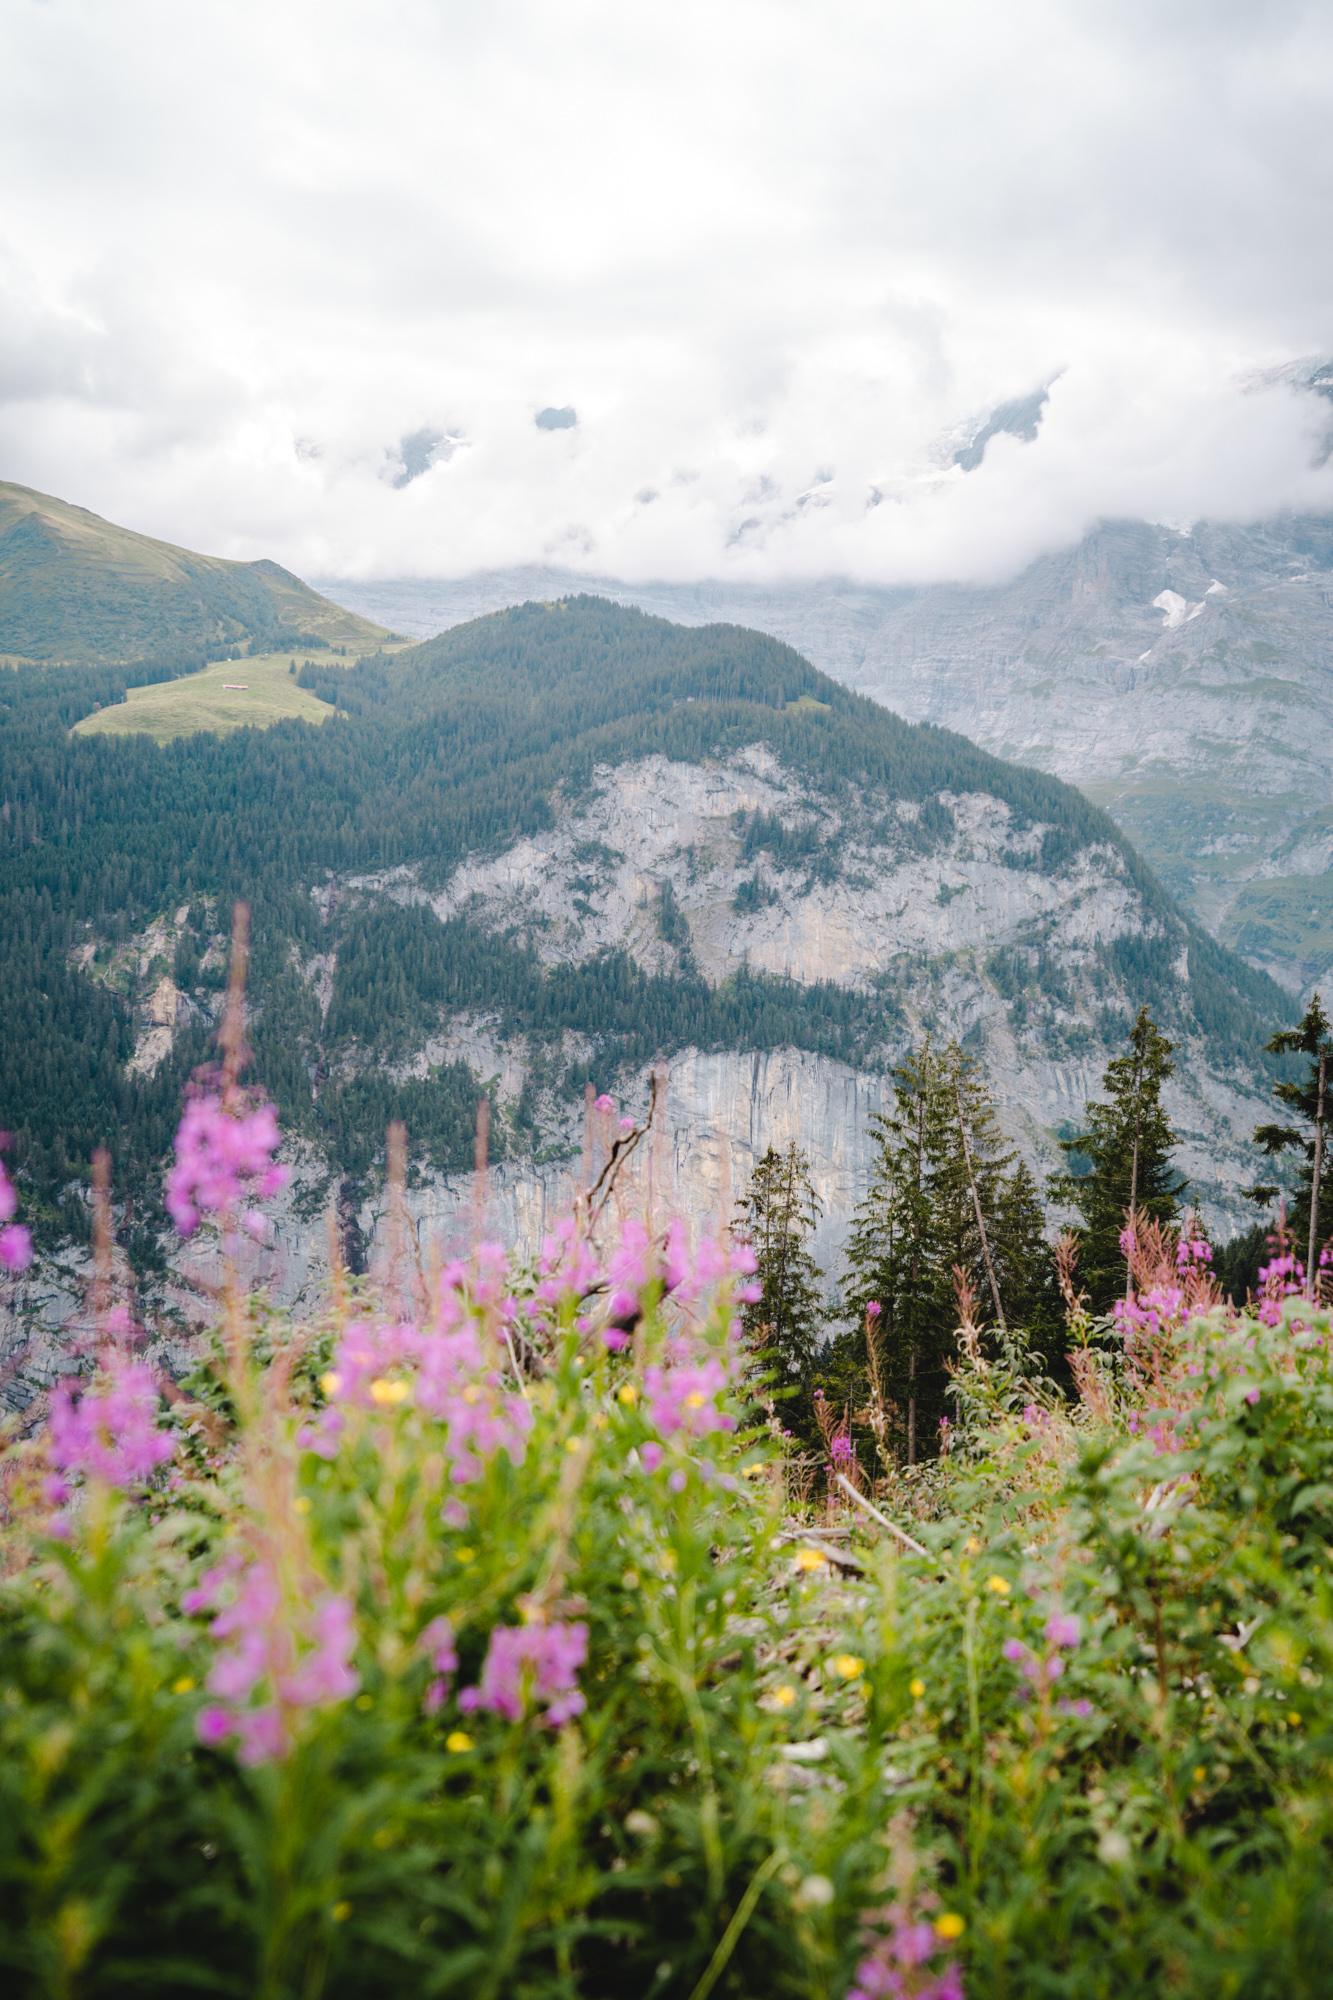 Hiking views over Lauterbrunnen Valley in Switzerland.